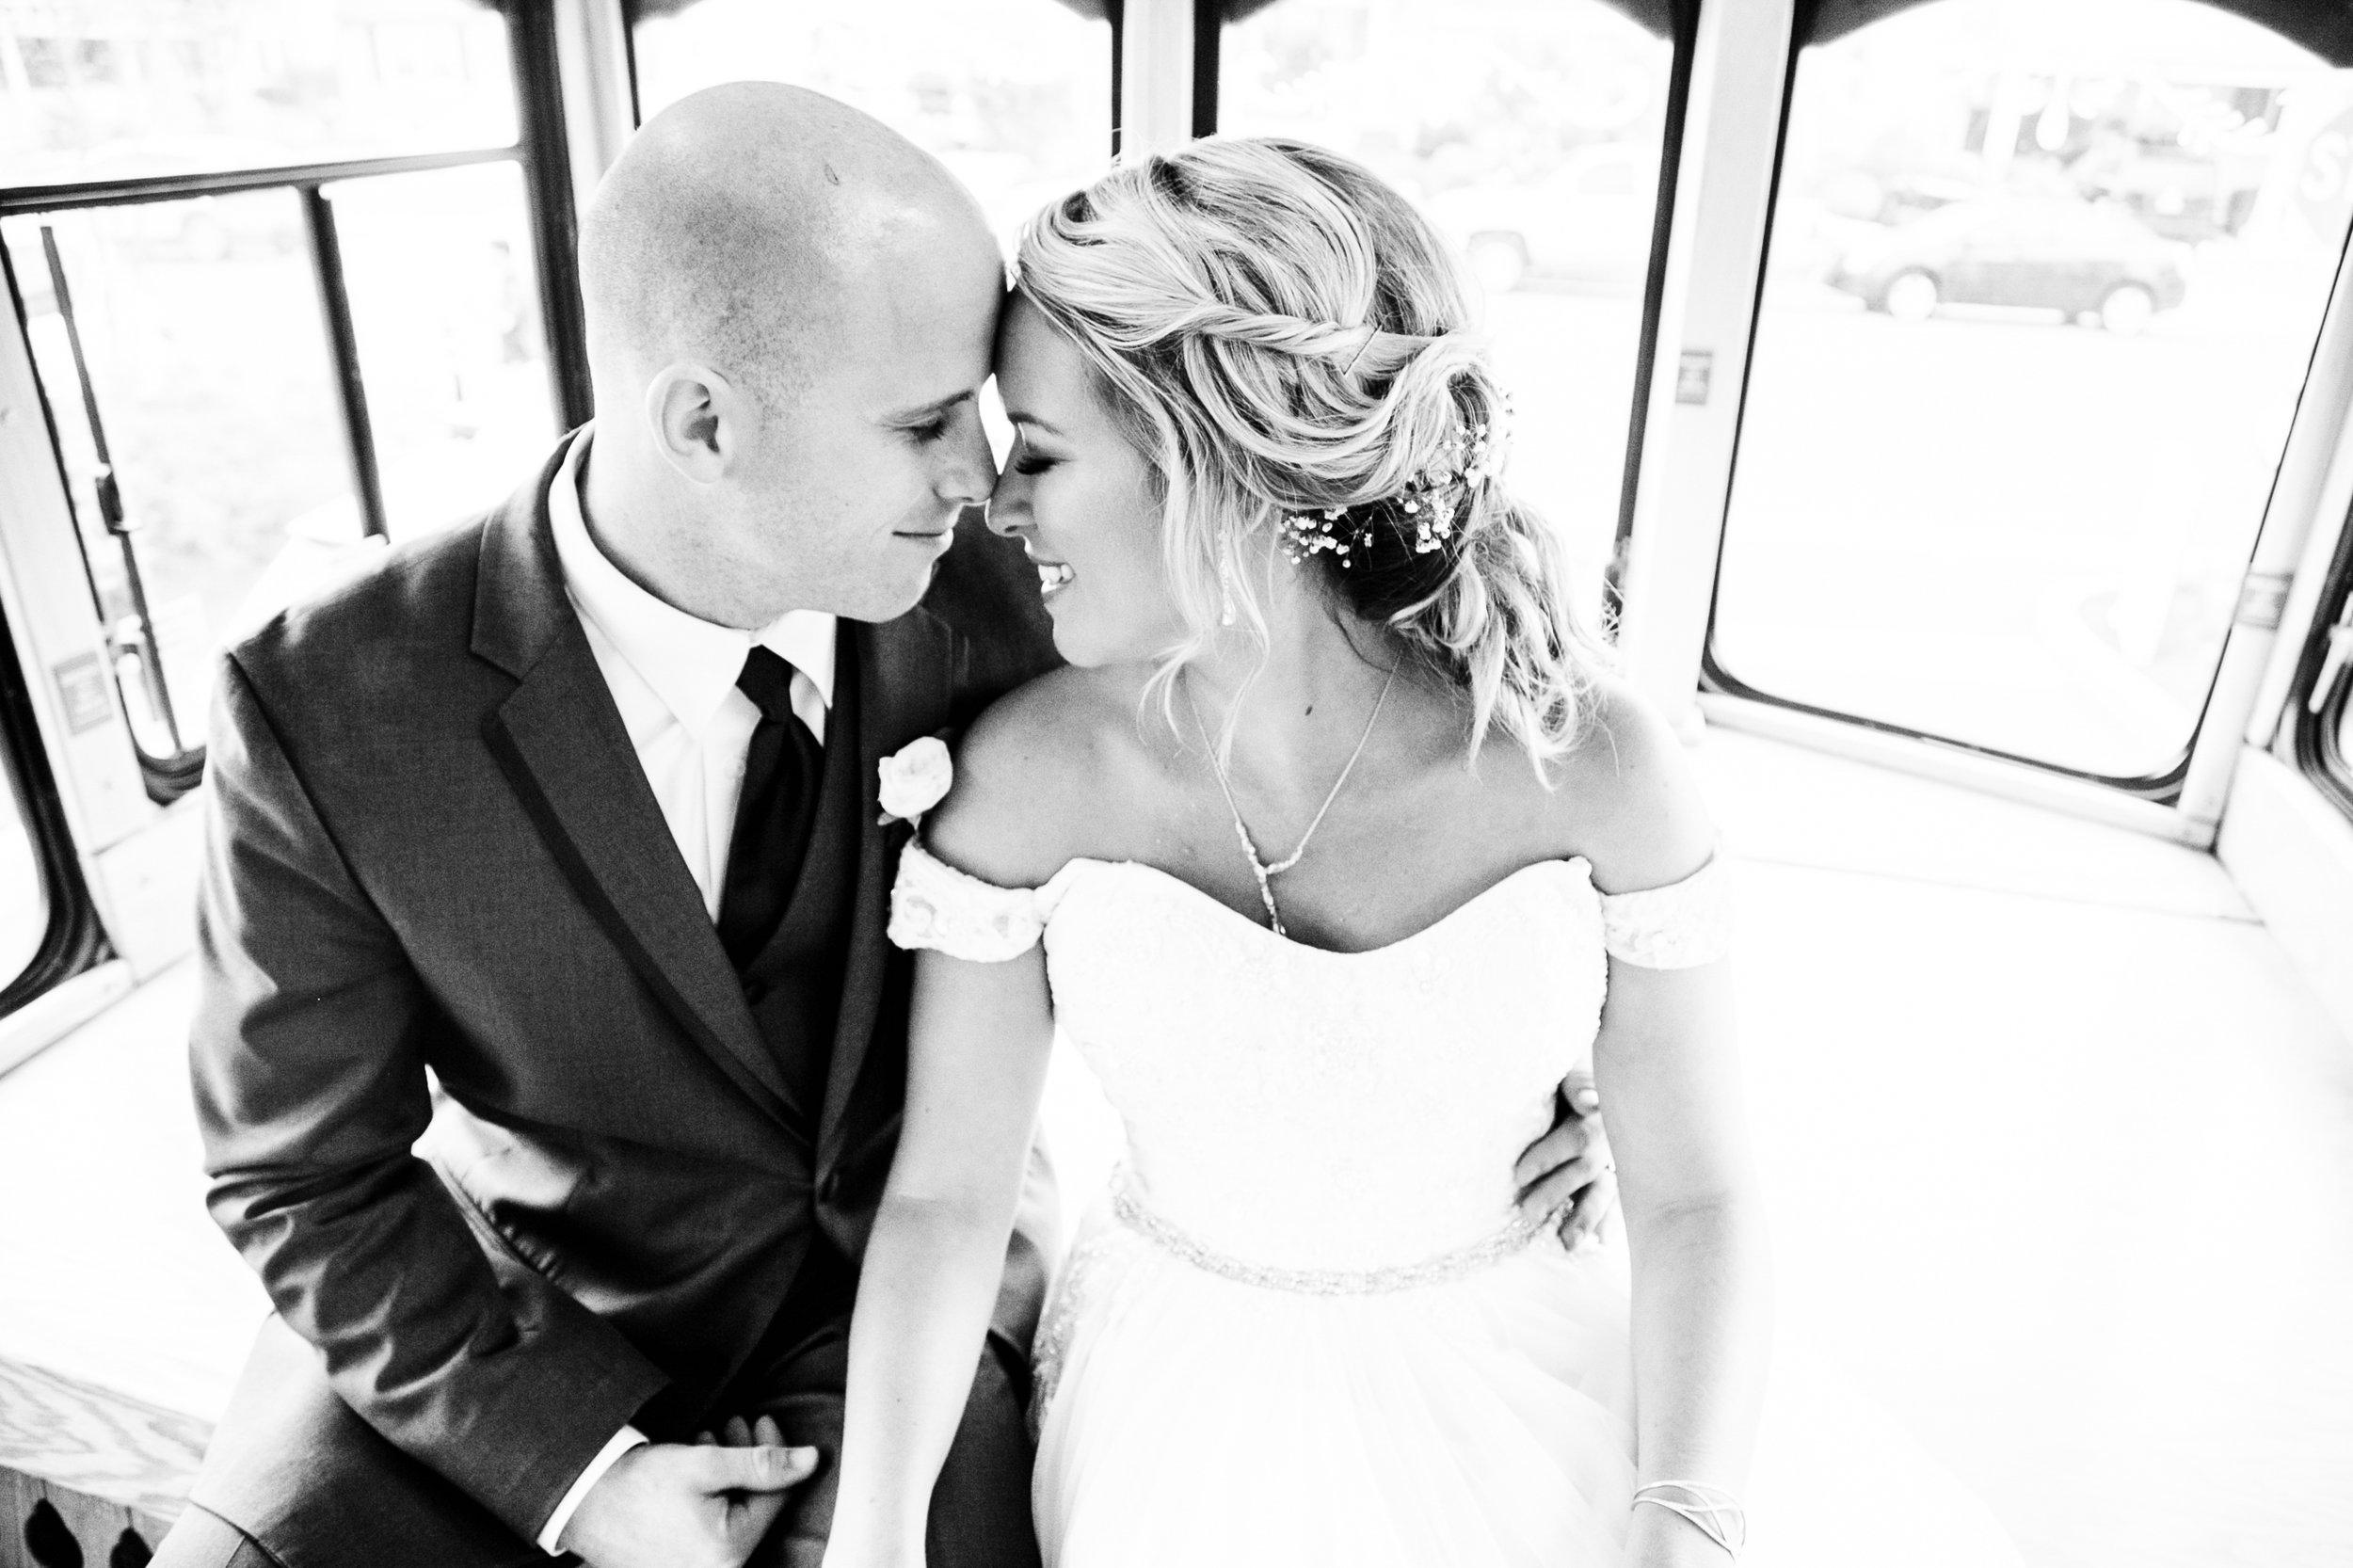 ICONA GOLDEN INN AVALON NJ WEDDING PHOTOGRAPHY  - 057.jpg